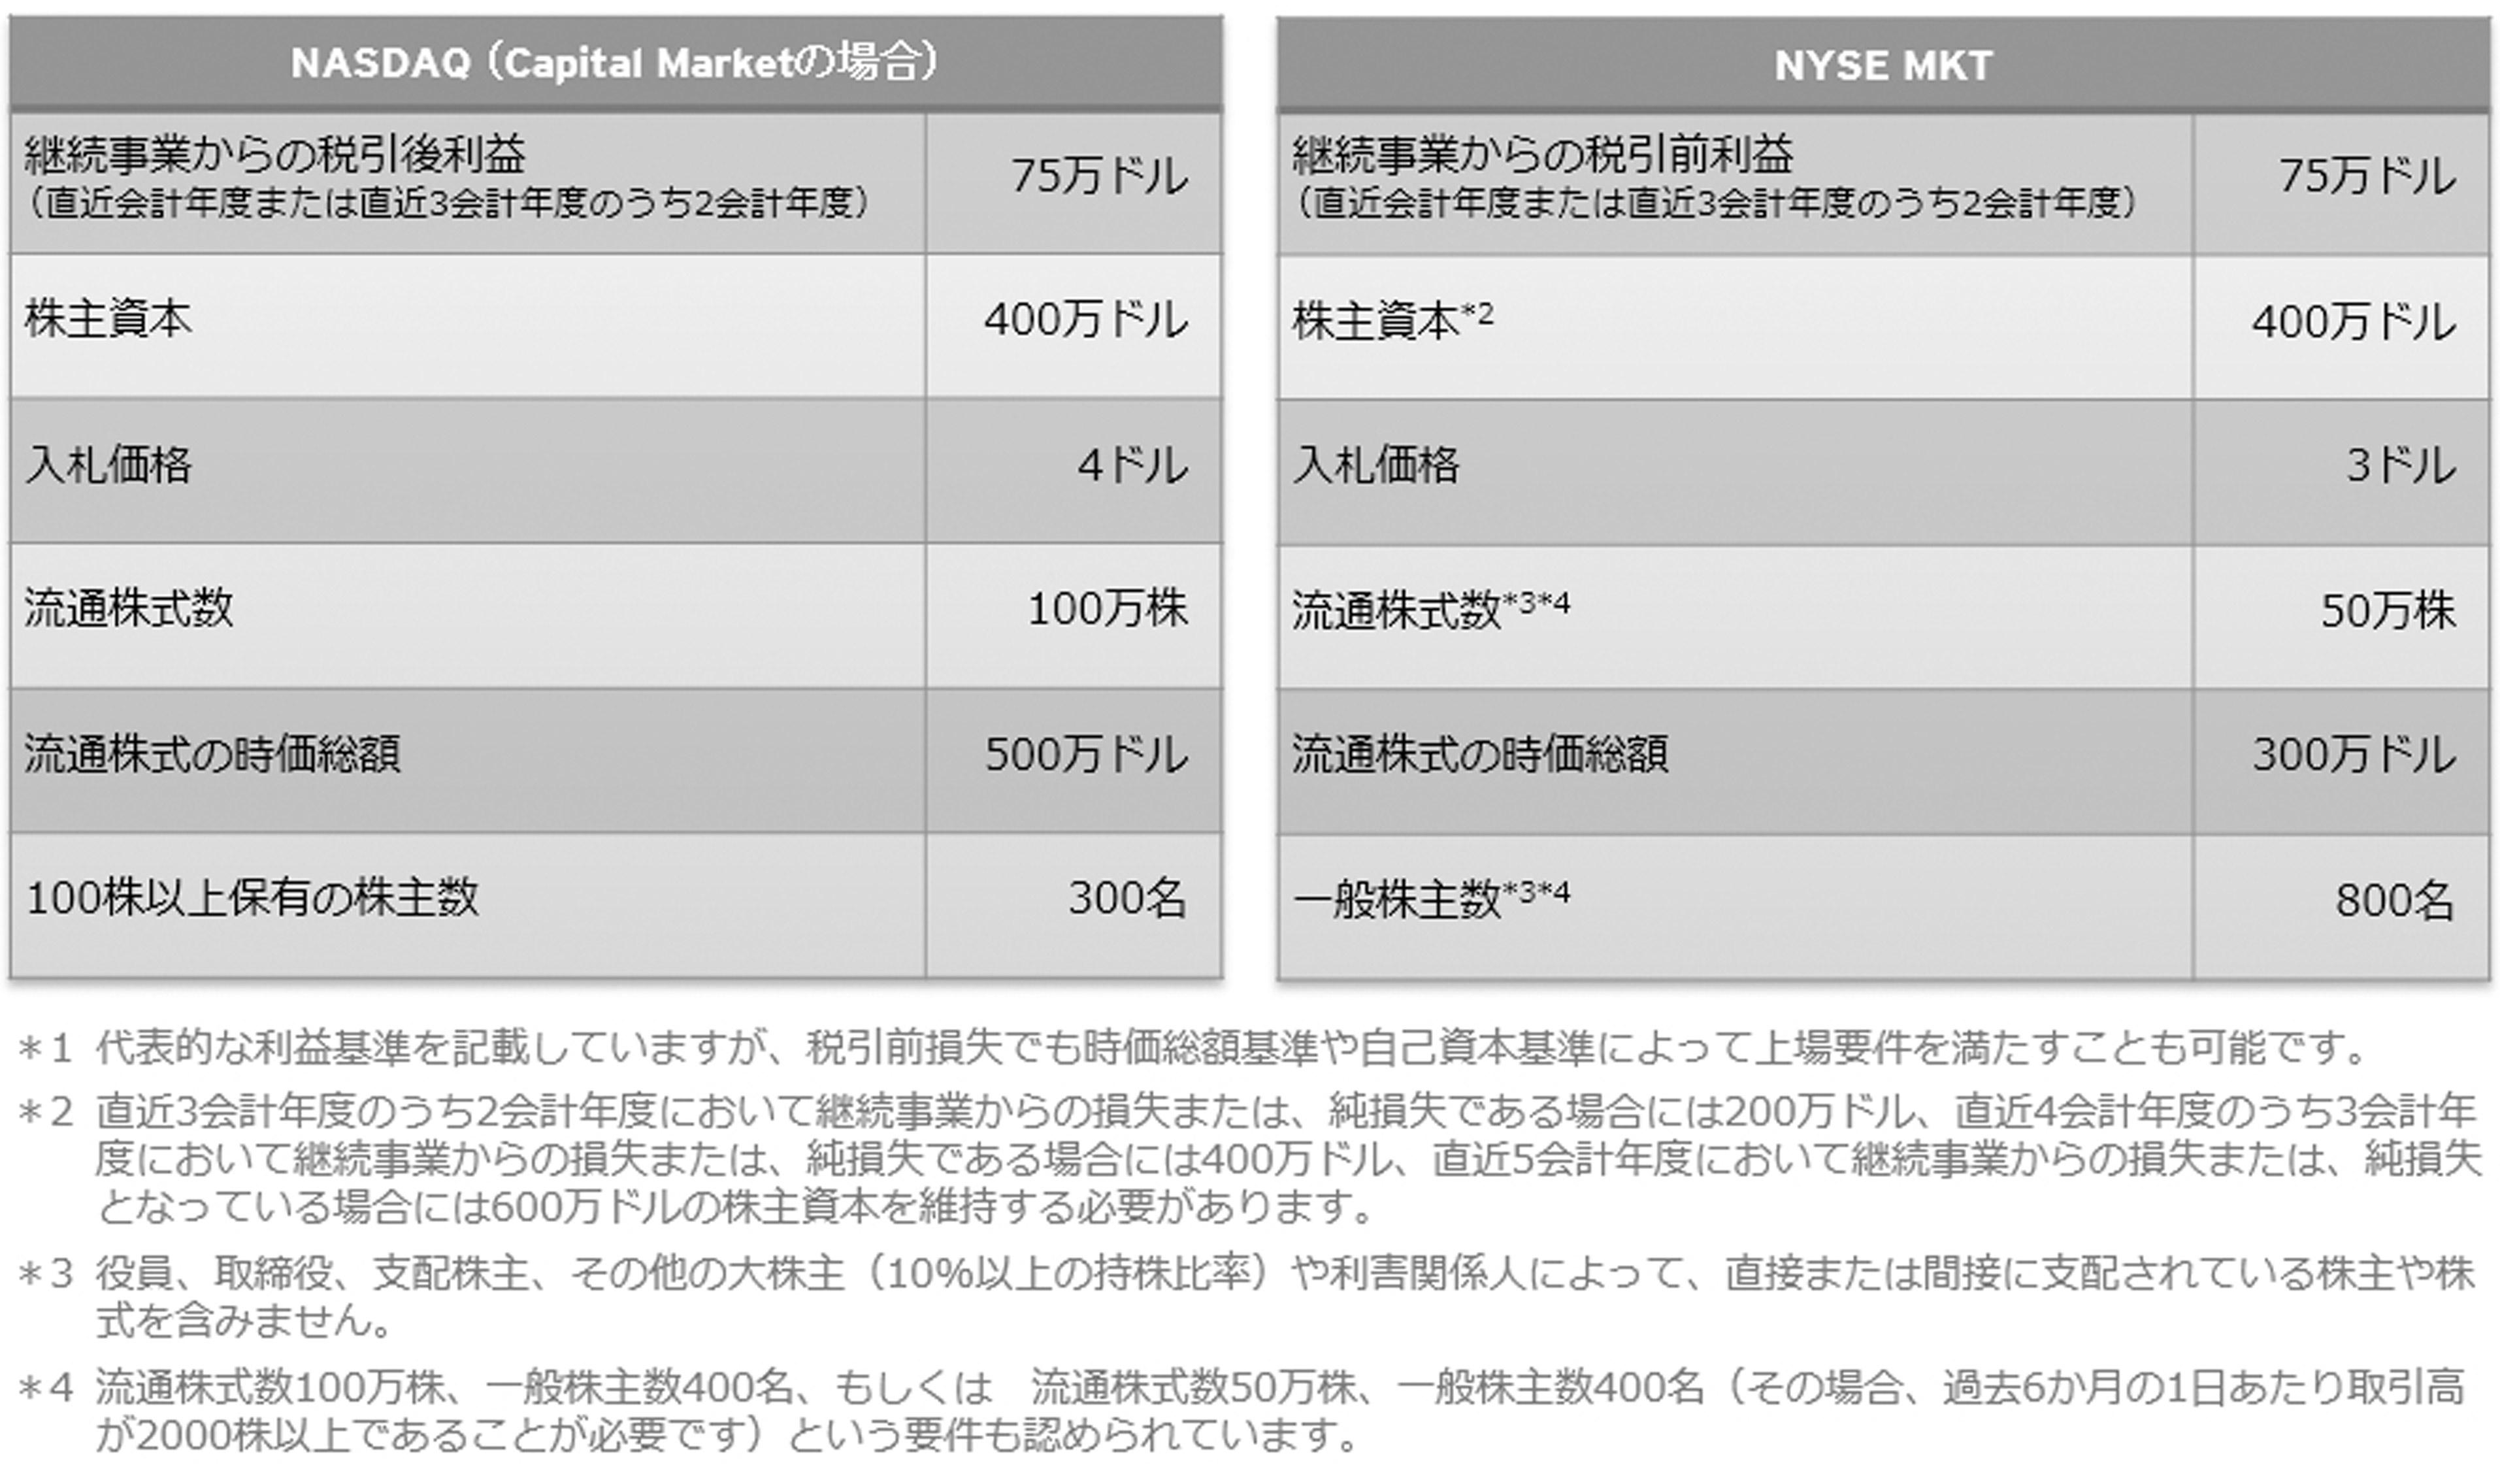 NASDAQ Capital MarketおよびNYSE MKTの上場要件 *1